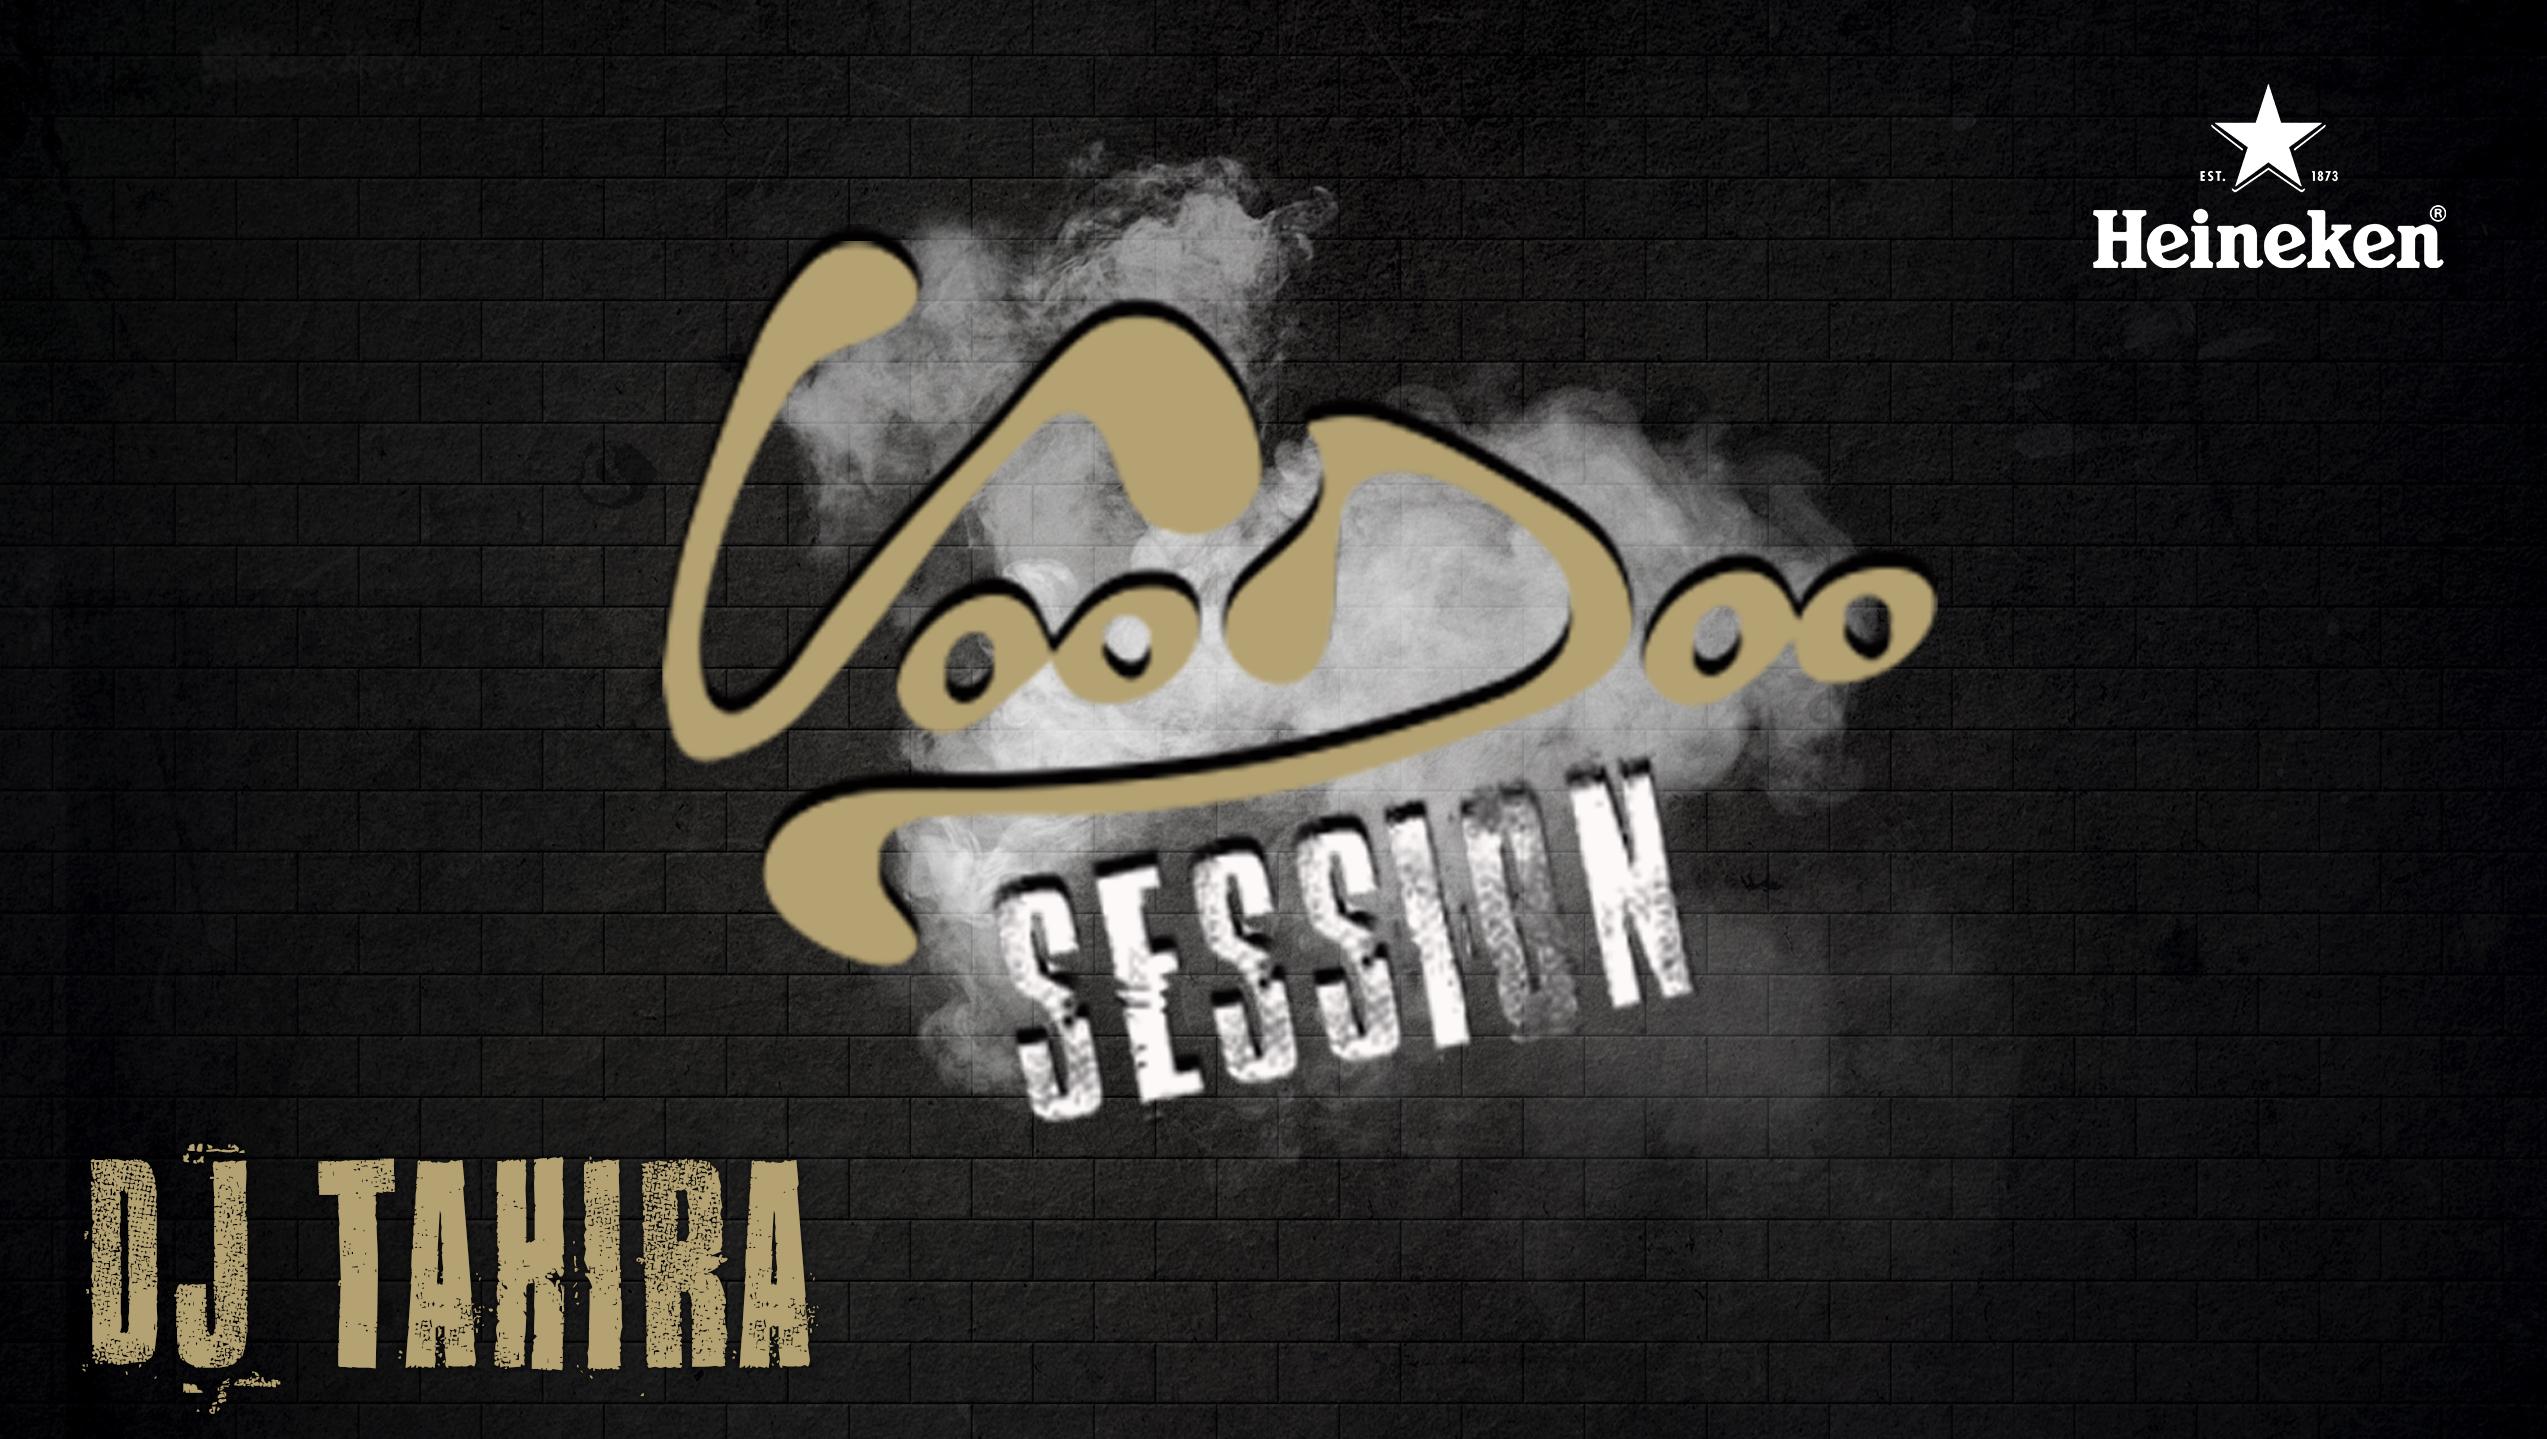 Session VooDoo #008 convida DJ Tahira